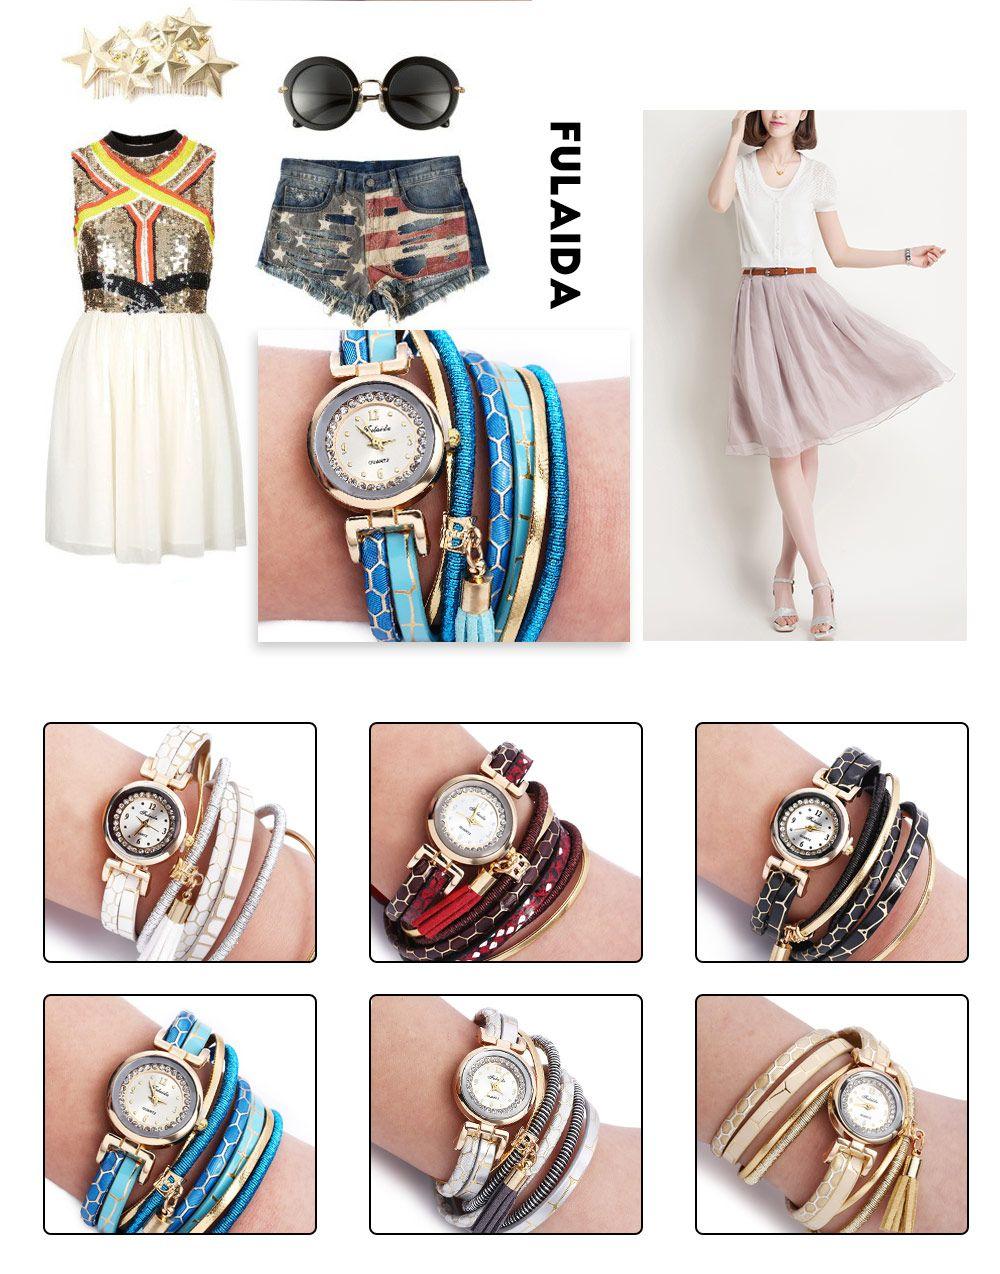 FULAIDA Women Quartz Watch Rhinestone Tassel Decoration Leather Band Wristwatch